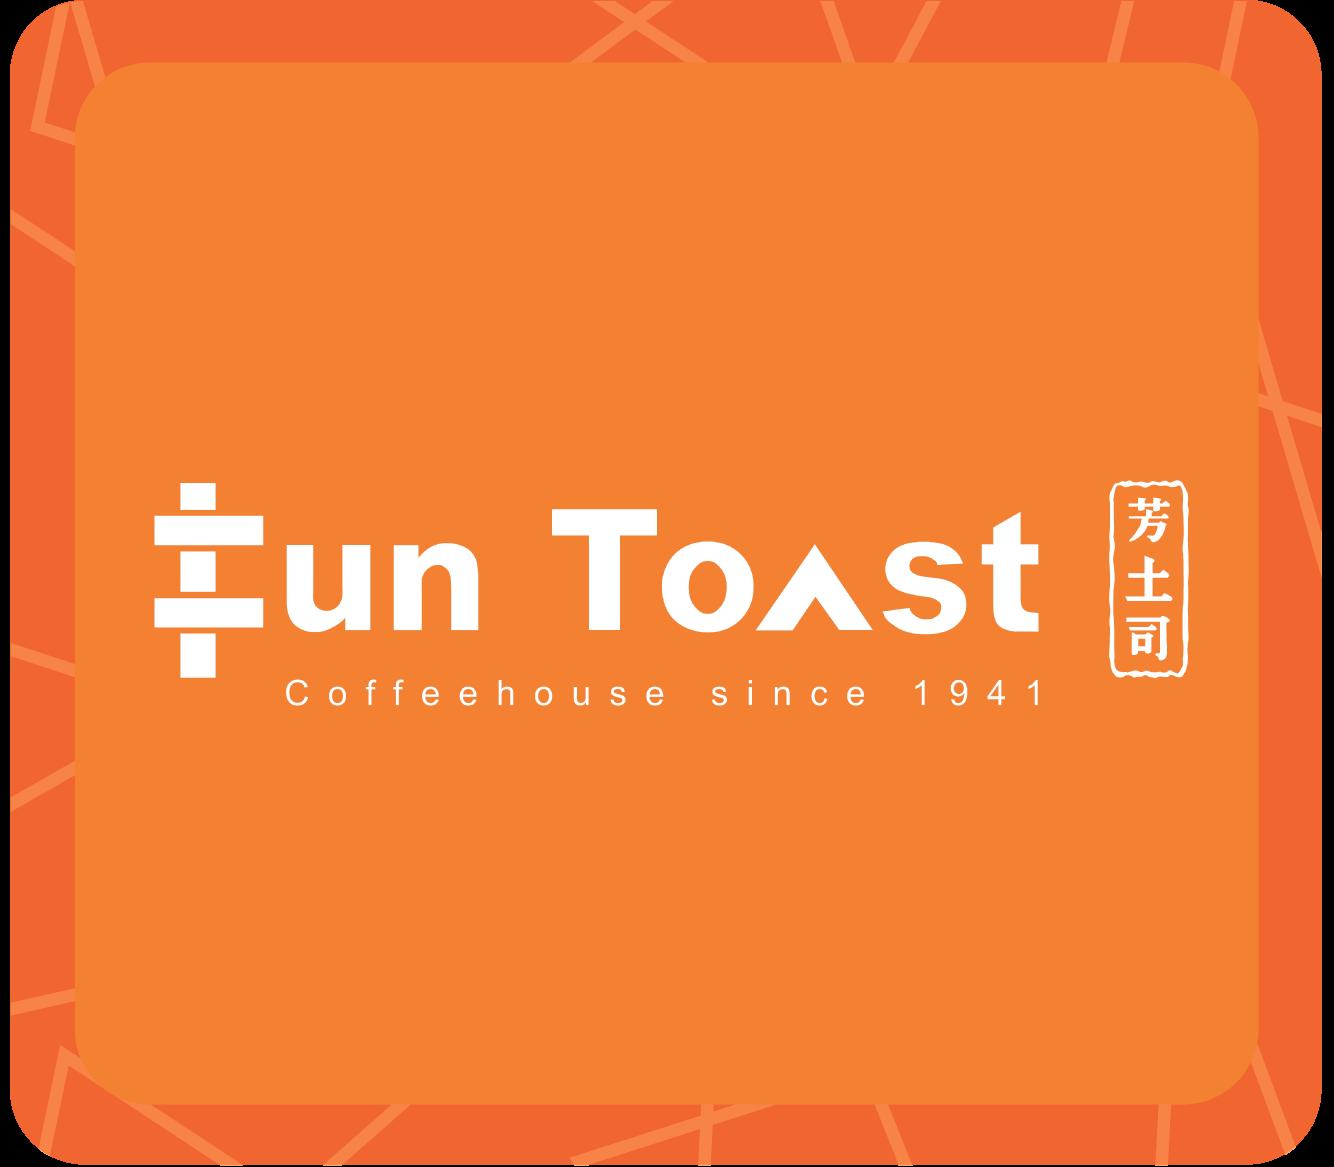 Climb Central x Fun Toast